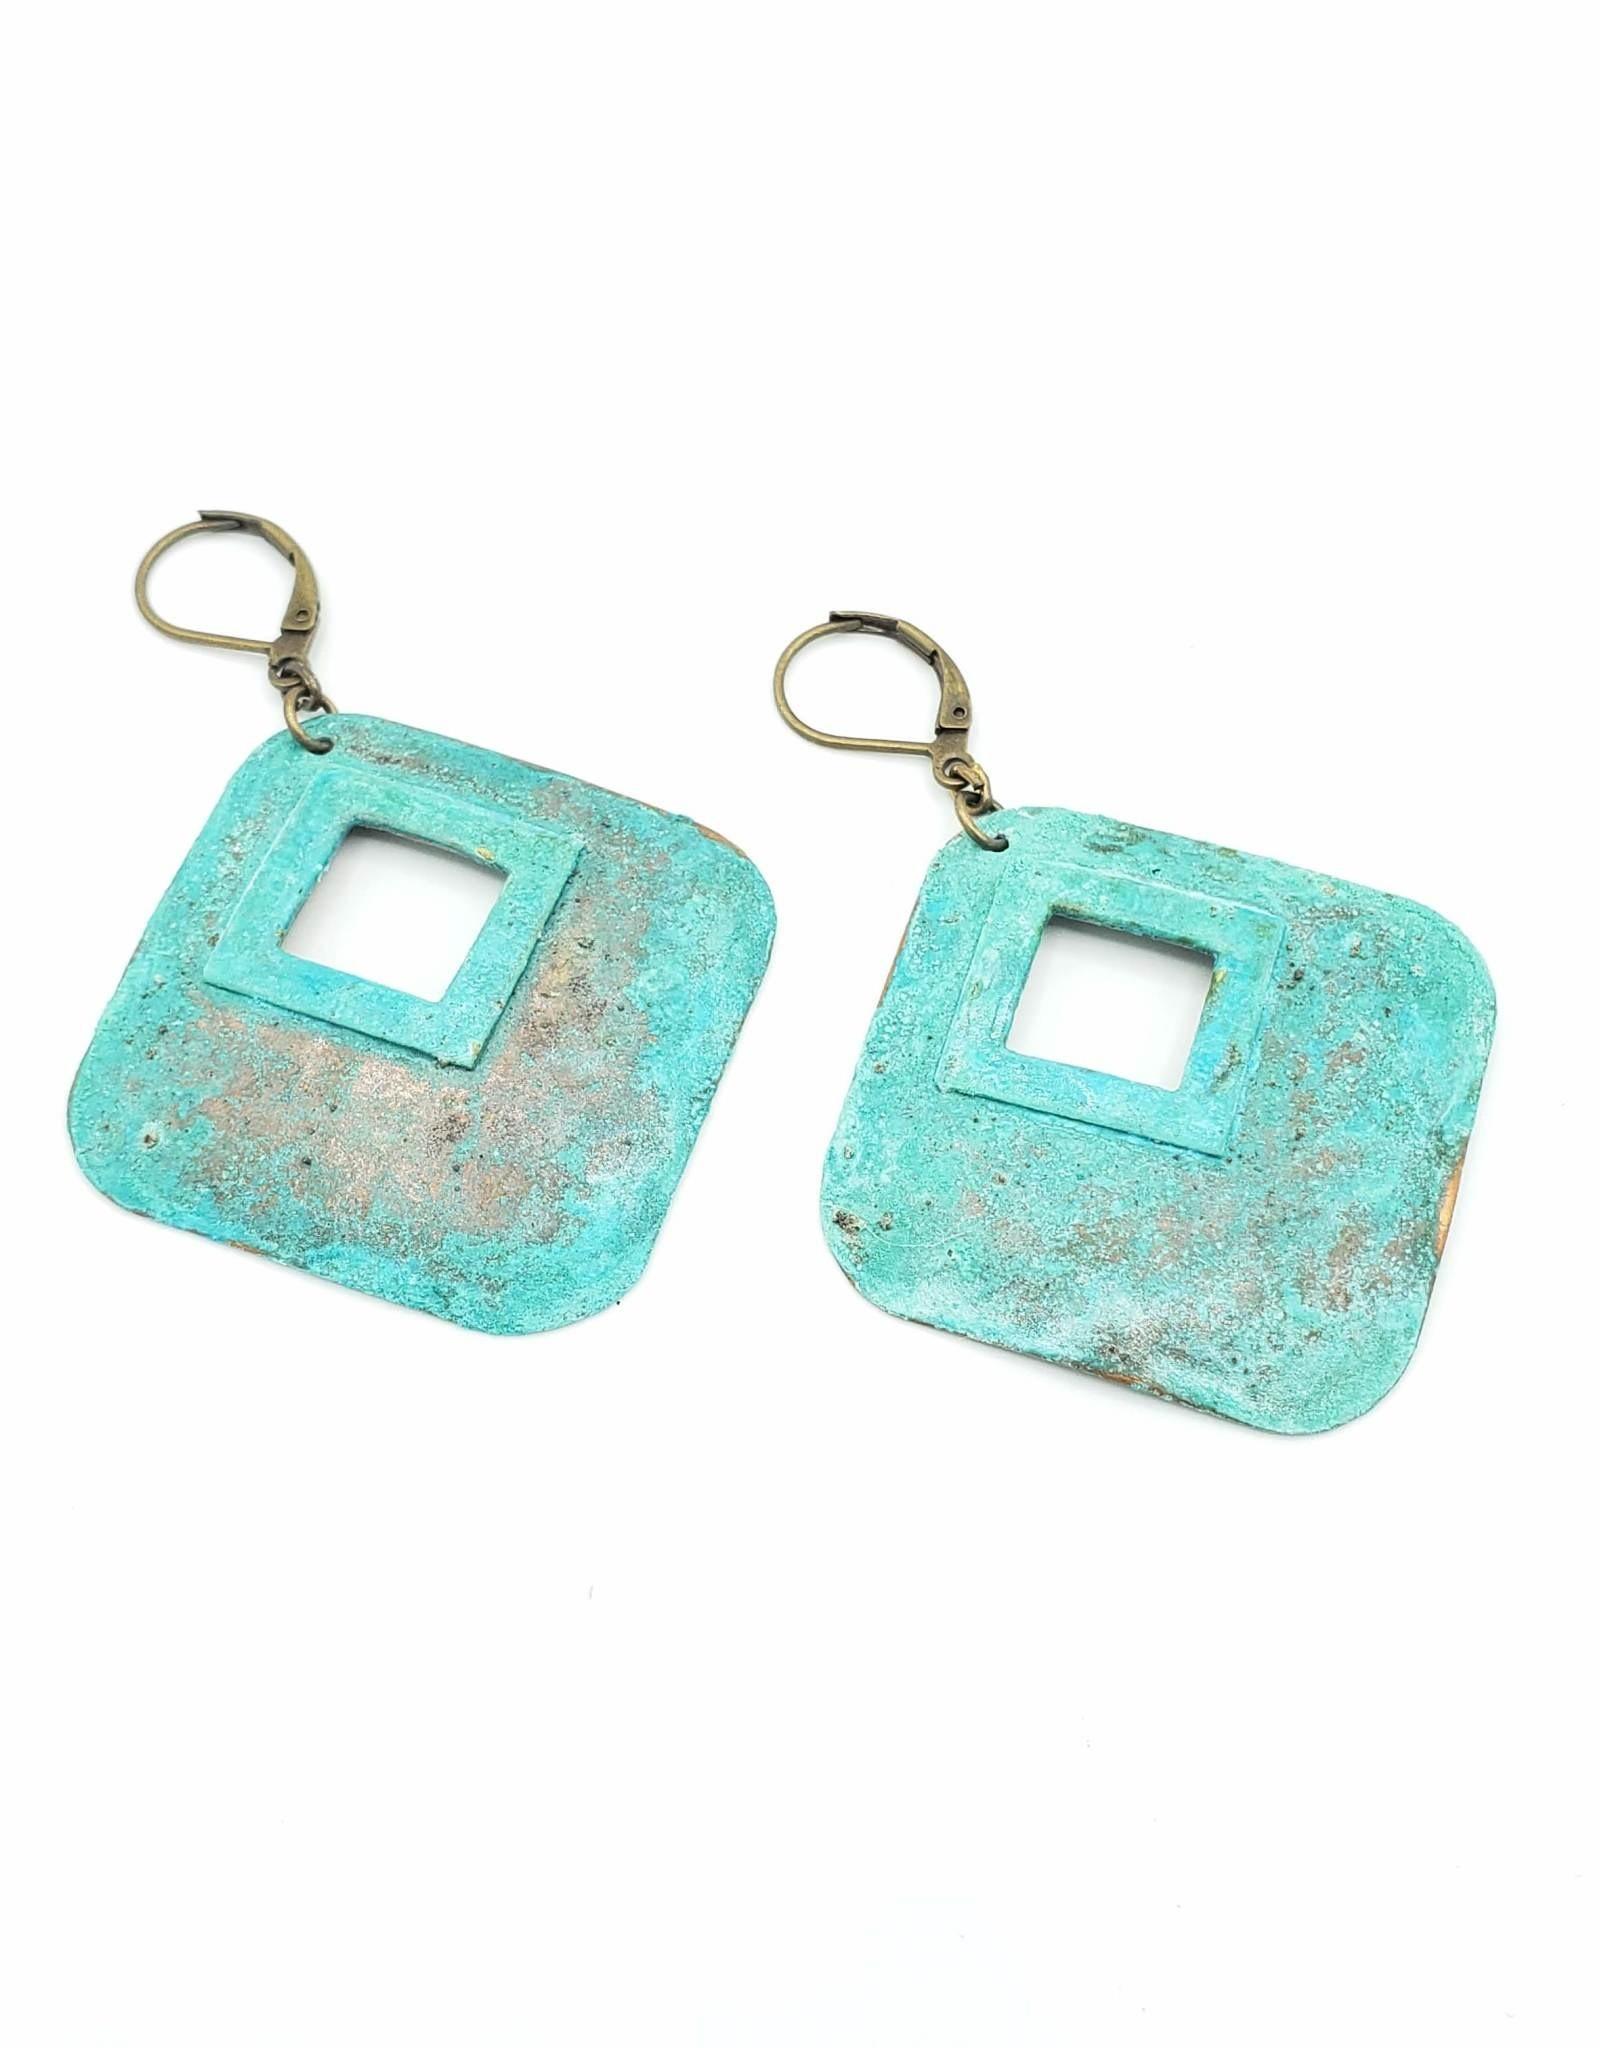 Hammered Diamond shape Earrings with Center Cutout - Brass & Copper Verdigris